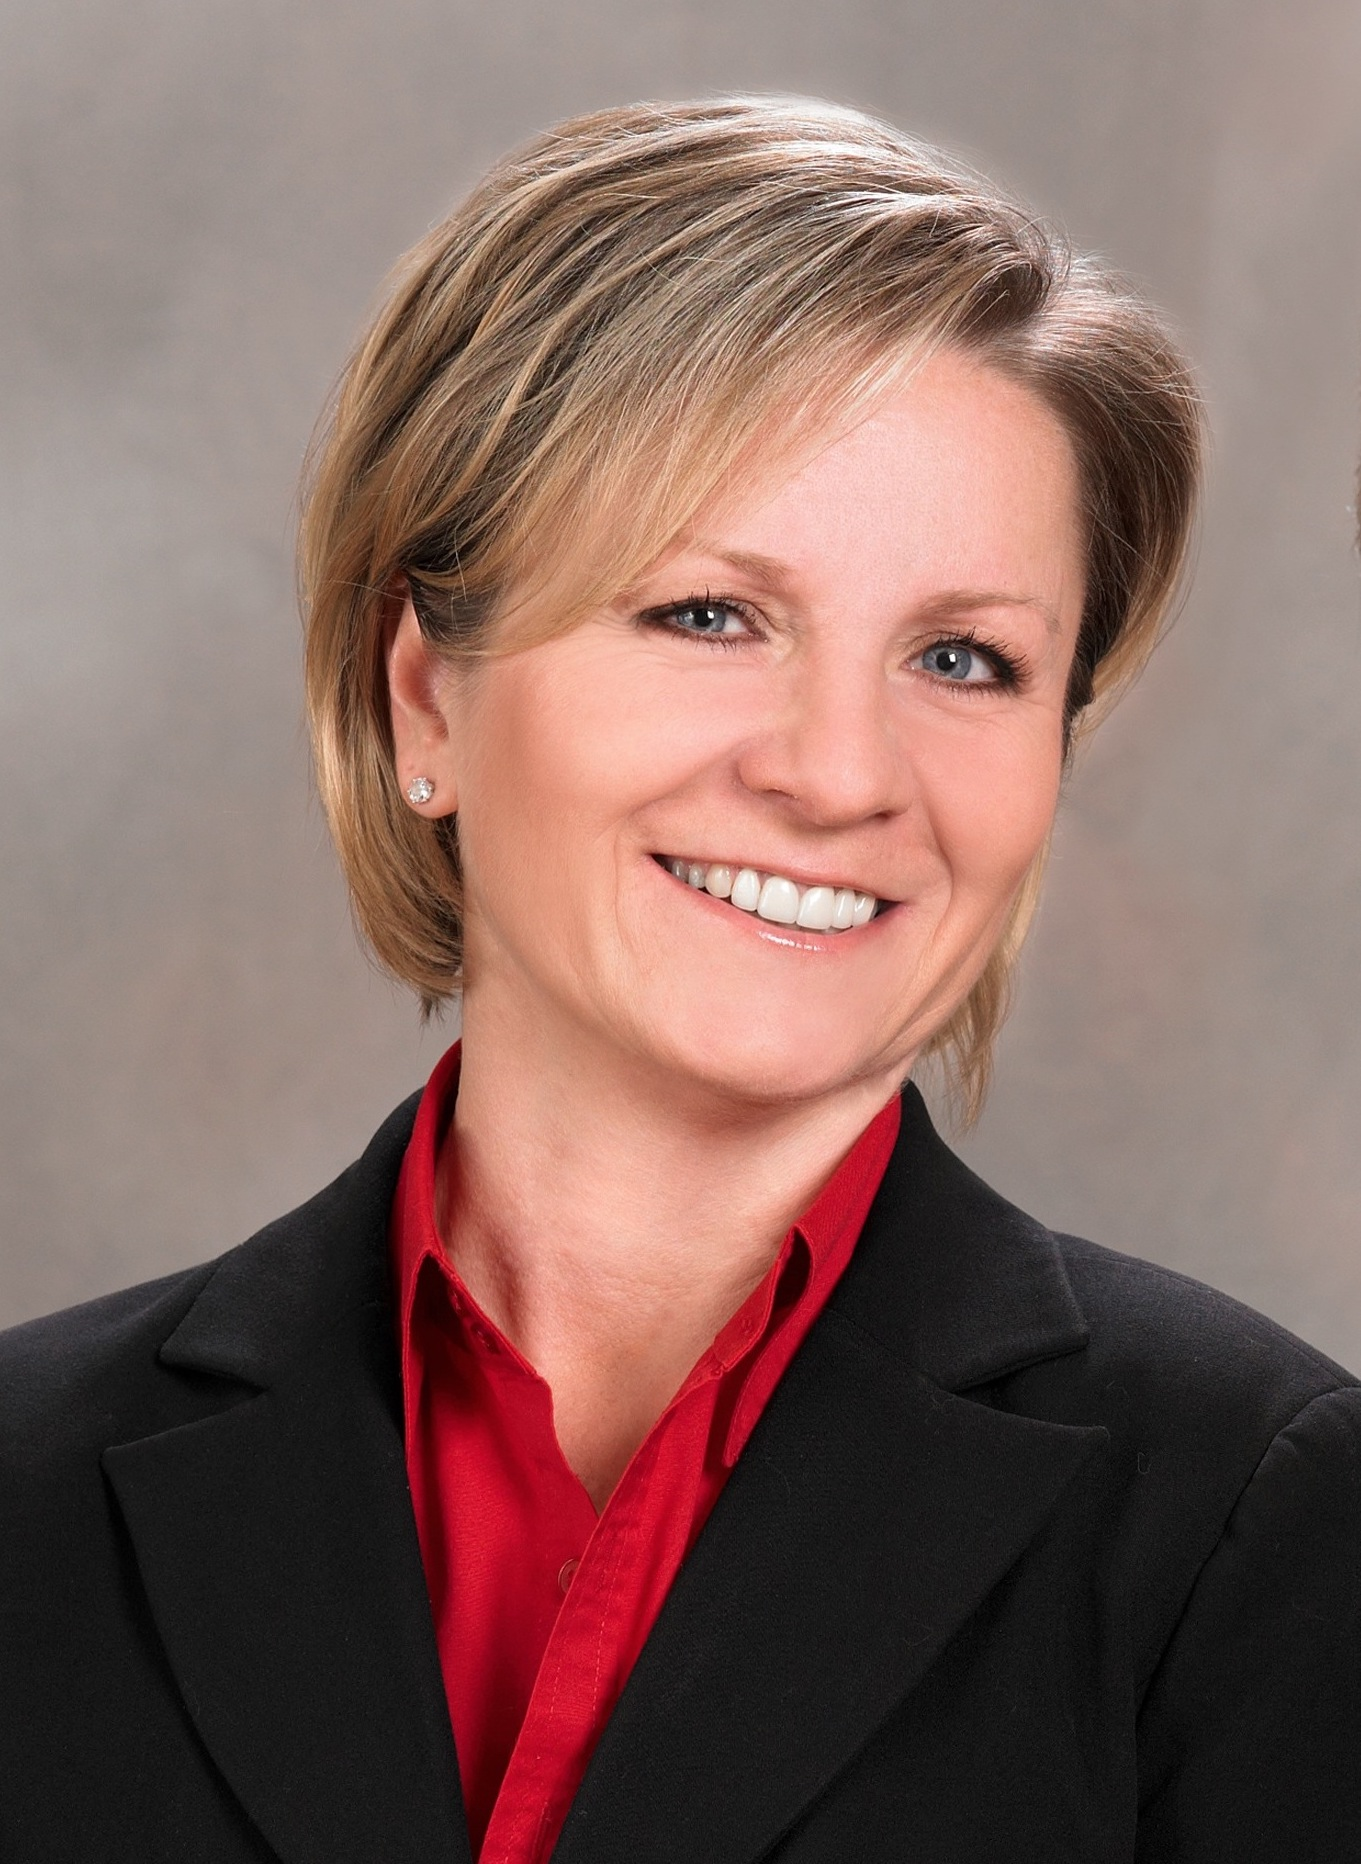 Barbara Mulcahy